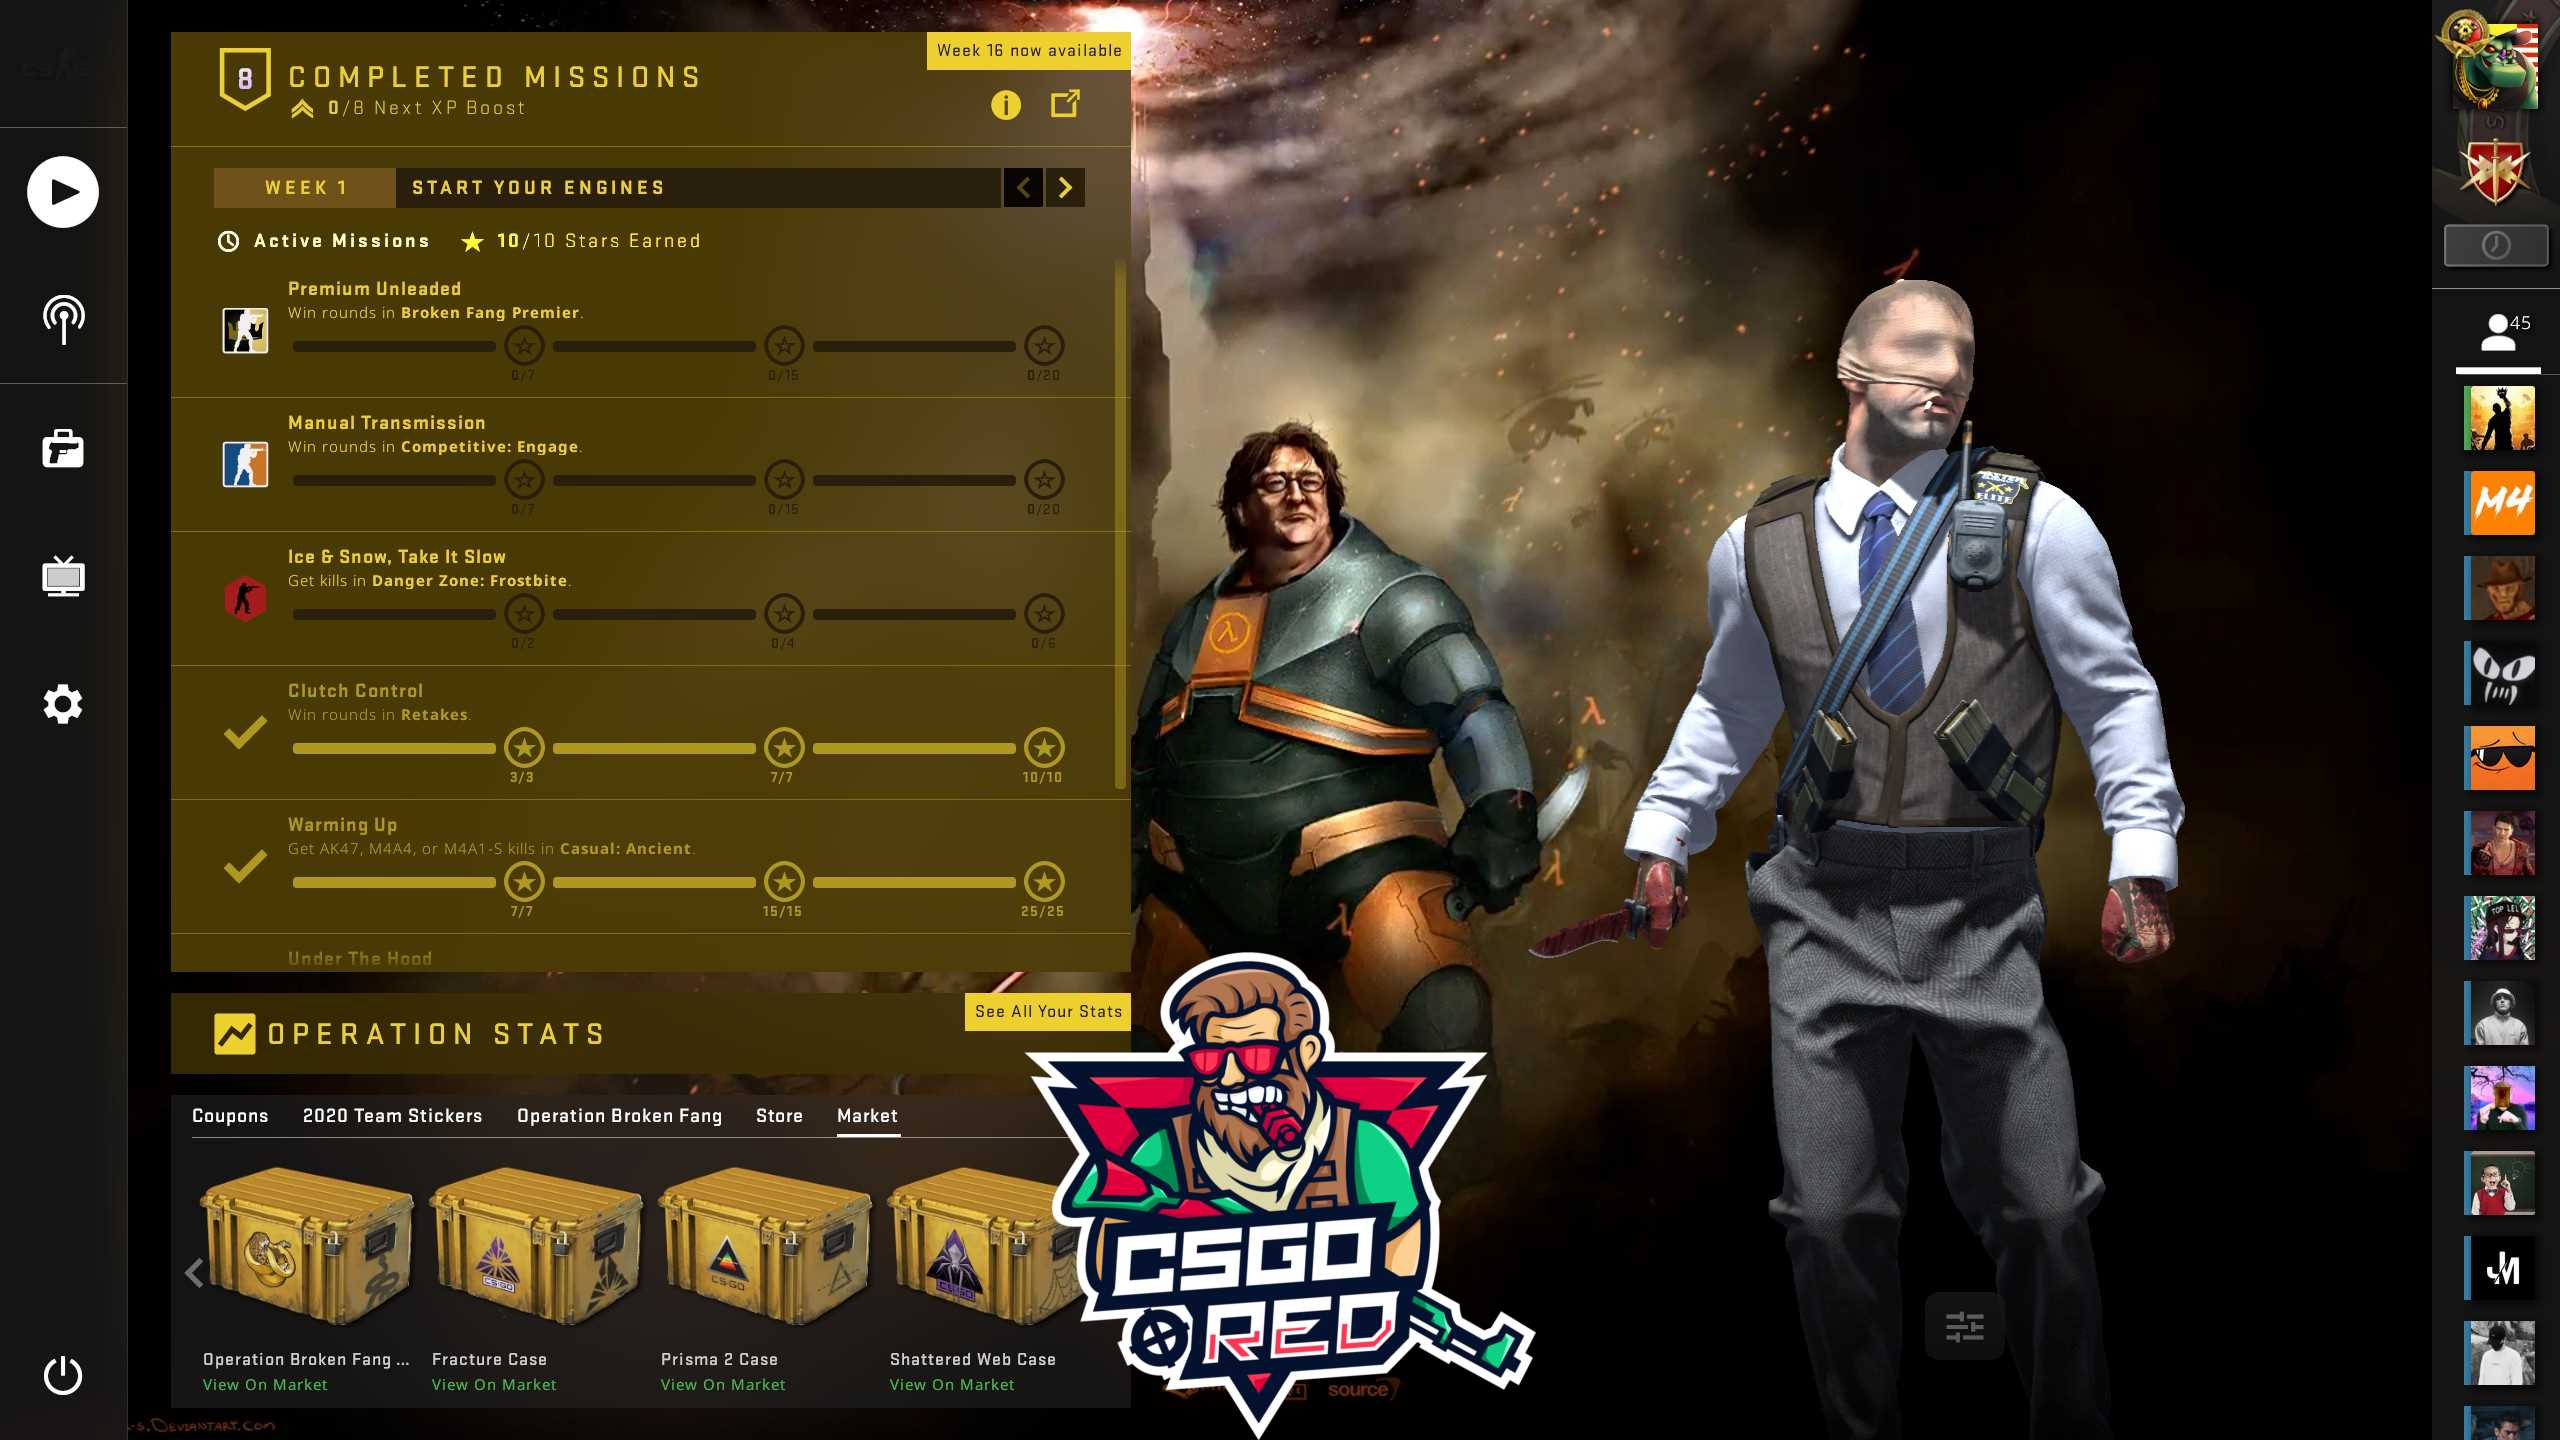 Gaben Half Life 3 Confirmed CSGO Panorama UI Background